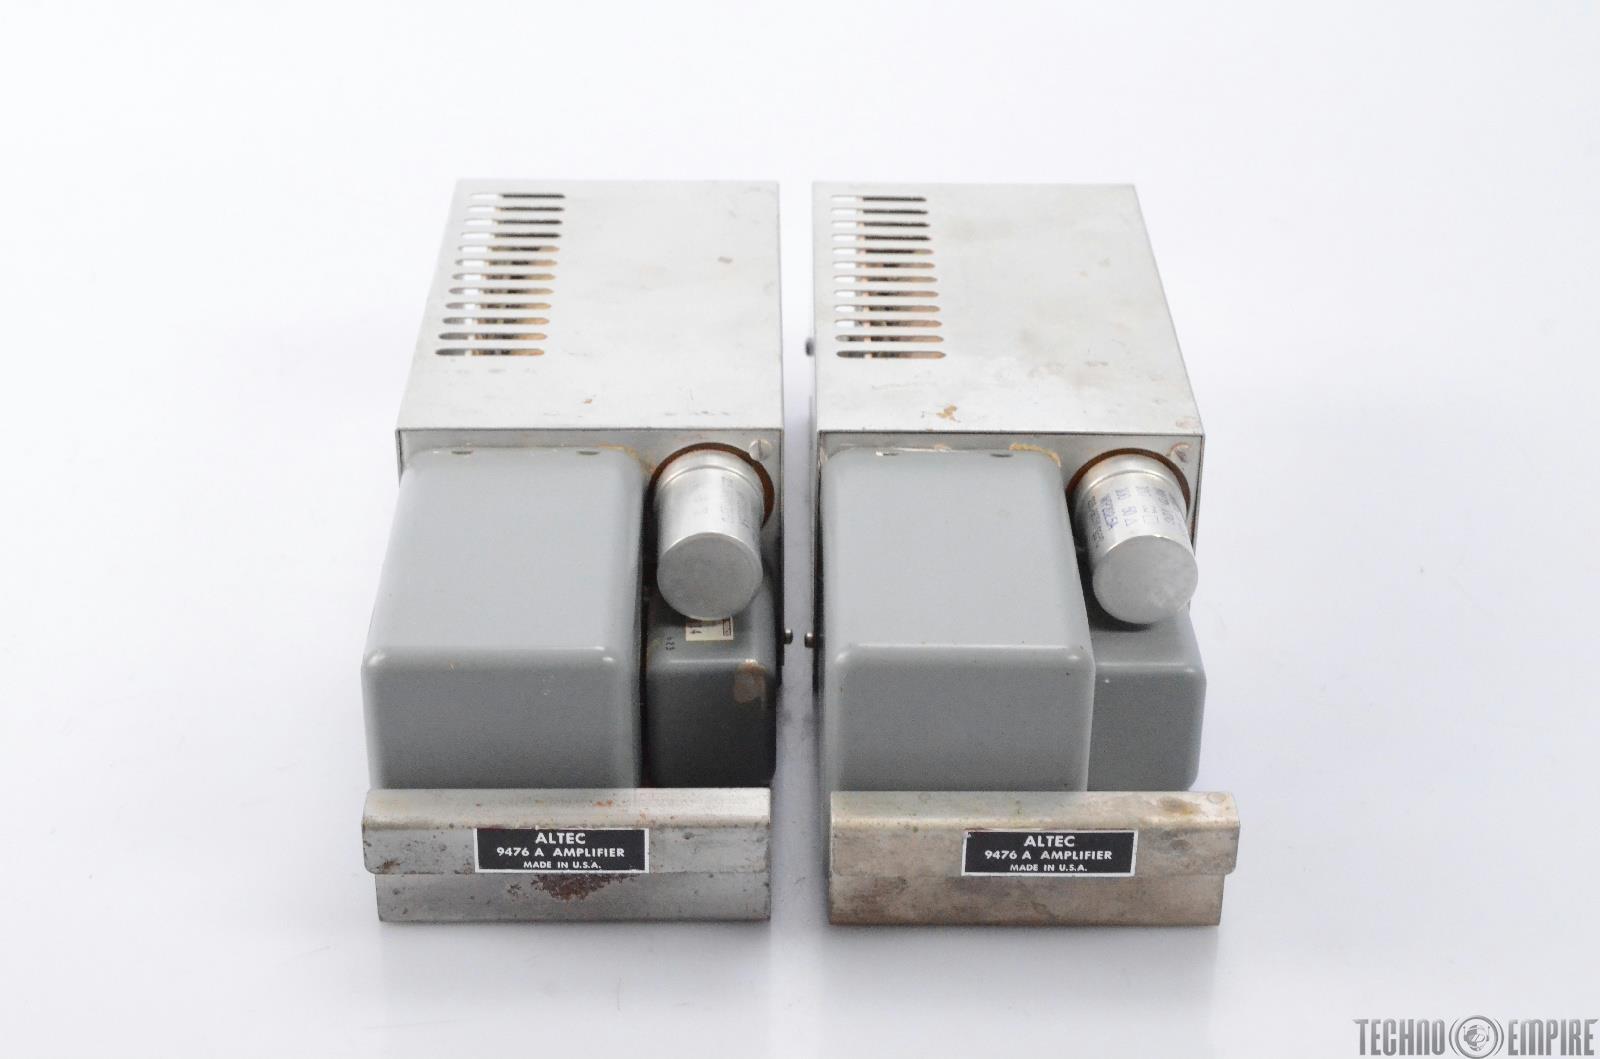 2 Altec 9476 A Monitor Cue Power Amplifier 9476A Fairfax Recordings #28580